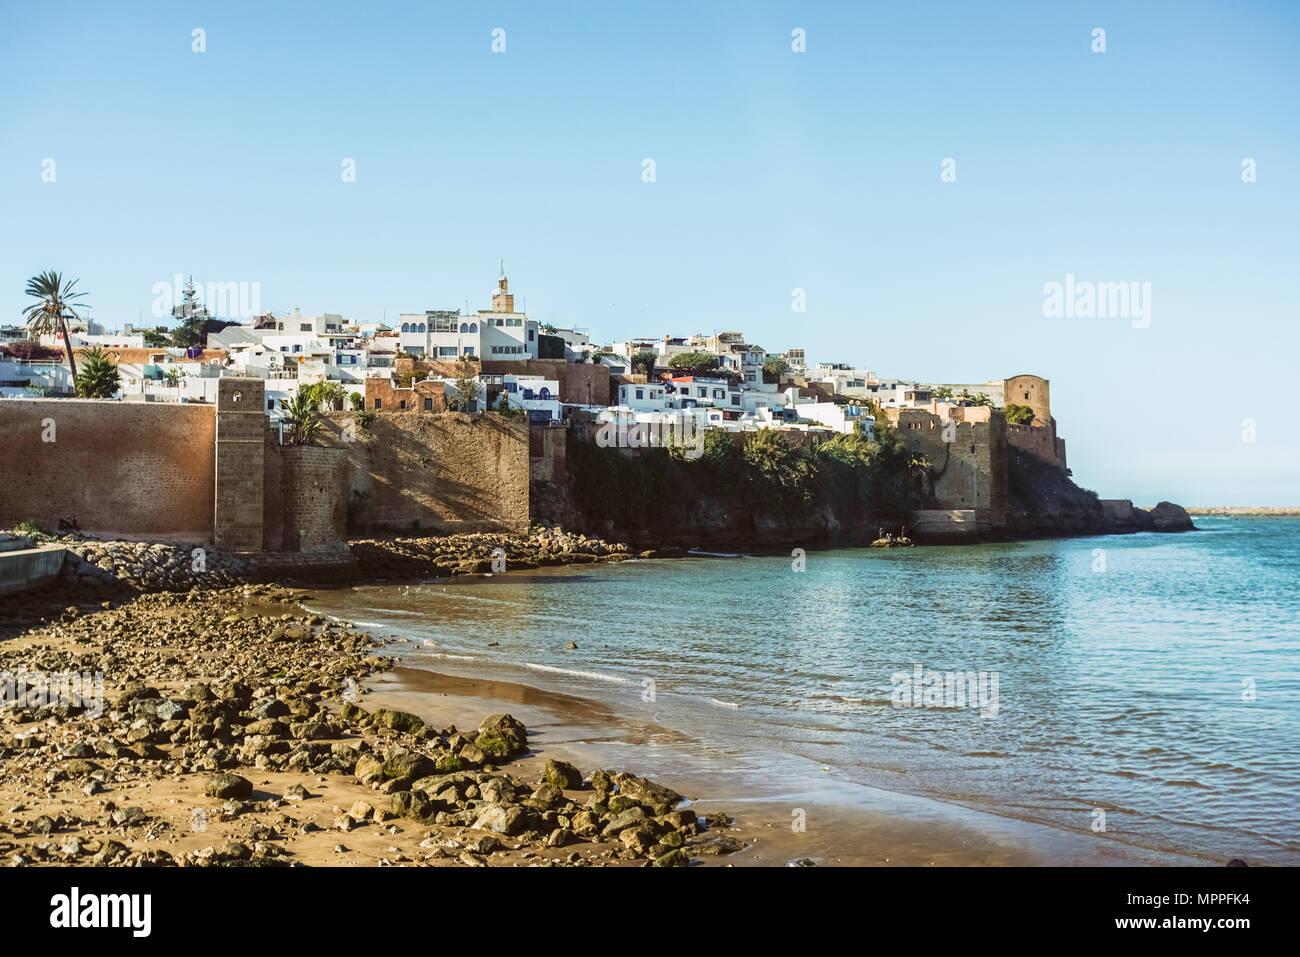 Morocco, Rabat, view to Kasbah - Stock Image